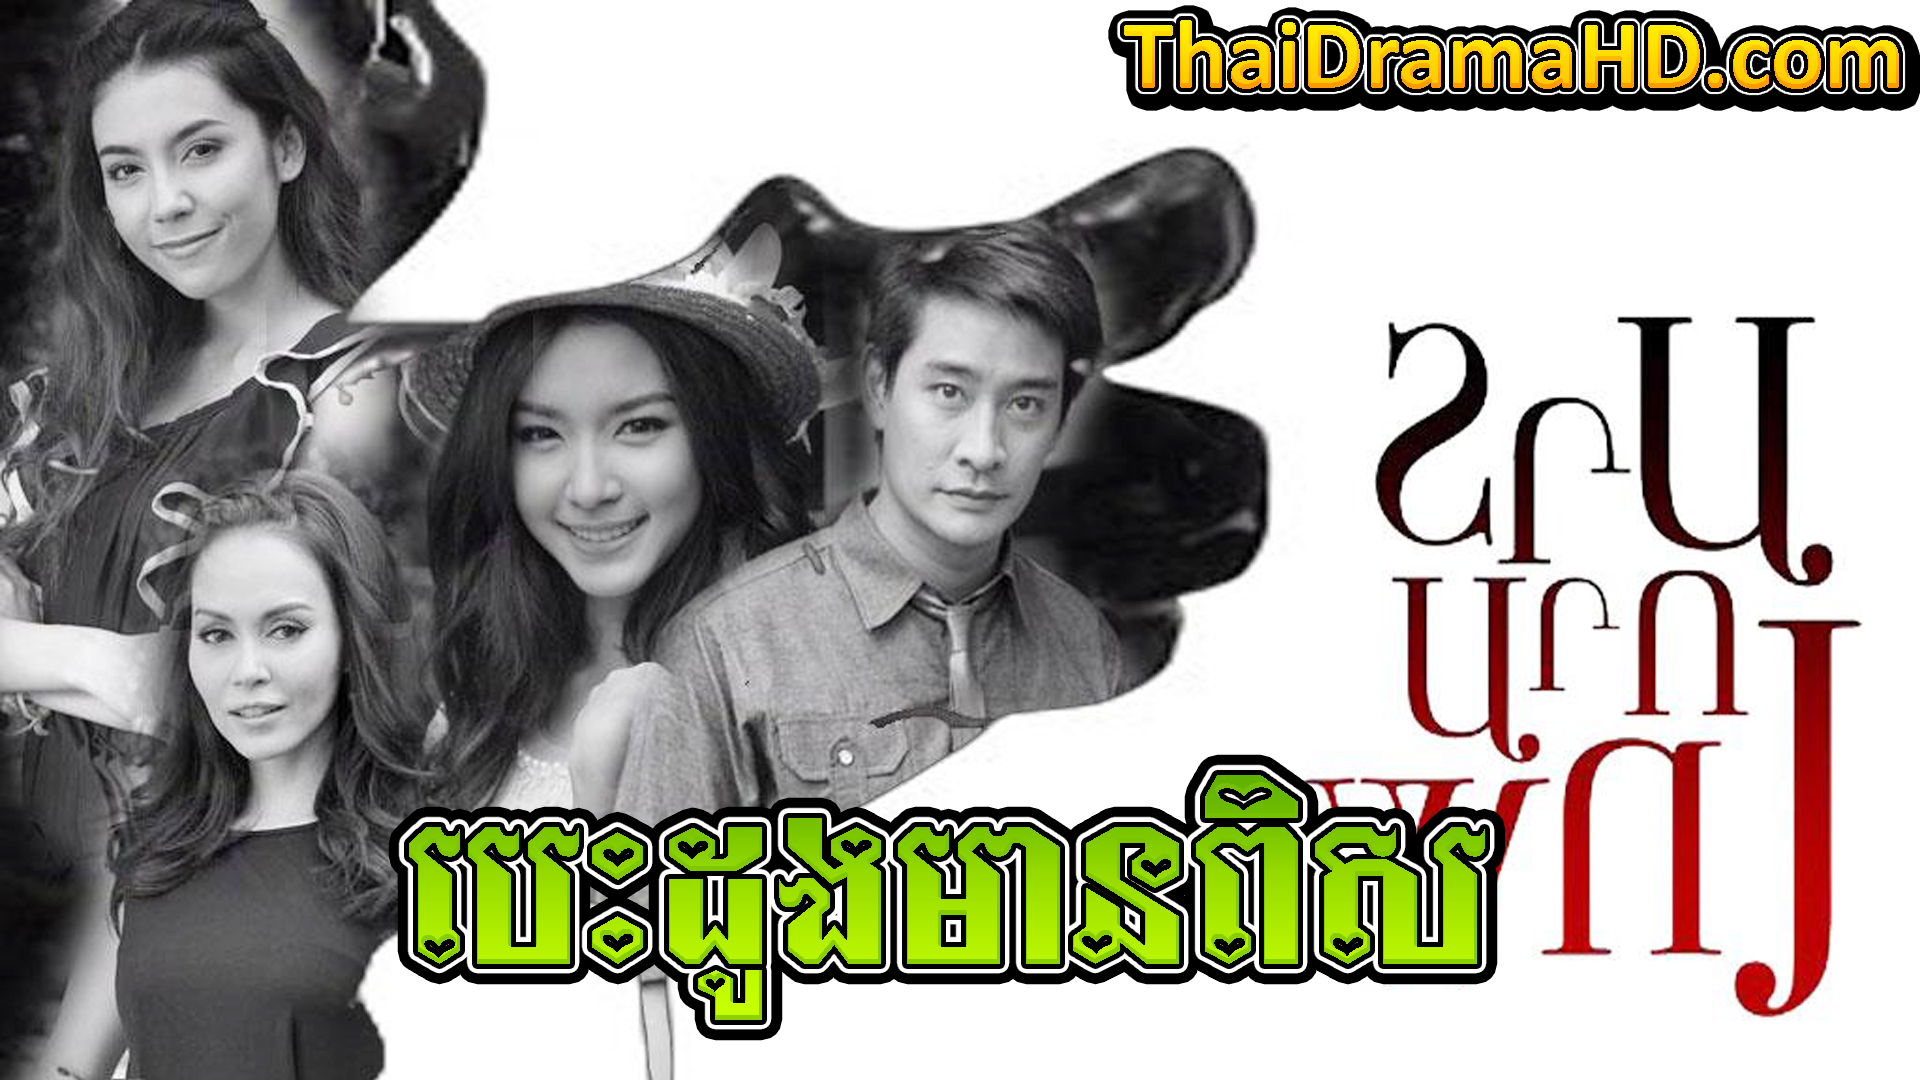 Besdong Mean Pirs | Thai Drama | Khmer Movie | Phumikhmer | movie-khmer | video4khmer | khmotions | kolabkhmer | khmer drama | ksdrama | cookingtips | roscheat | khmertimeskh | khmerkomsan | phumi7 | merlkon | film2us | movie2kh | sweetdrama | khmercitylove | khreplay | tvb cambodia drama | ckh7 | srokthai | phumimedia | phumi8 | khmer avenue | khmer search | Soyo | khmerfans